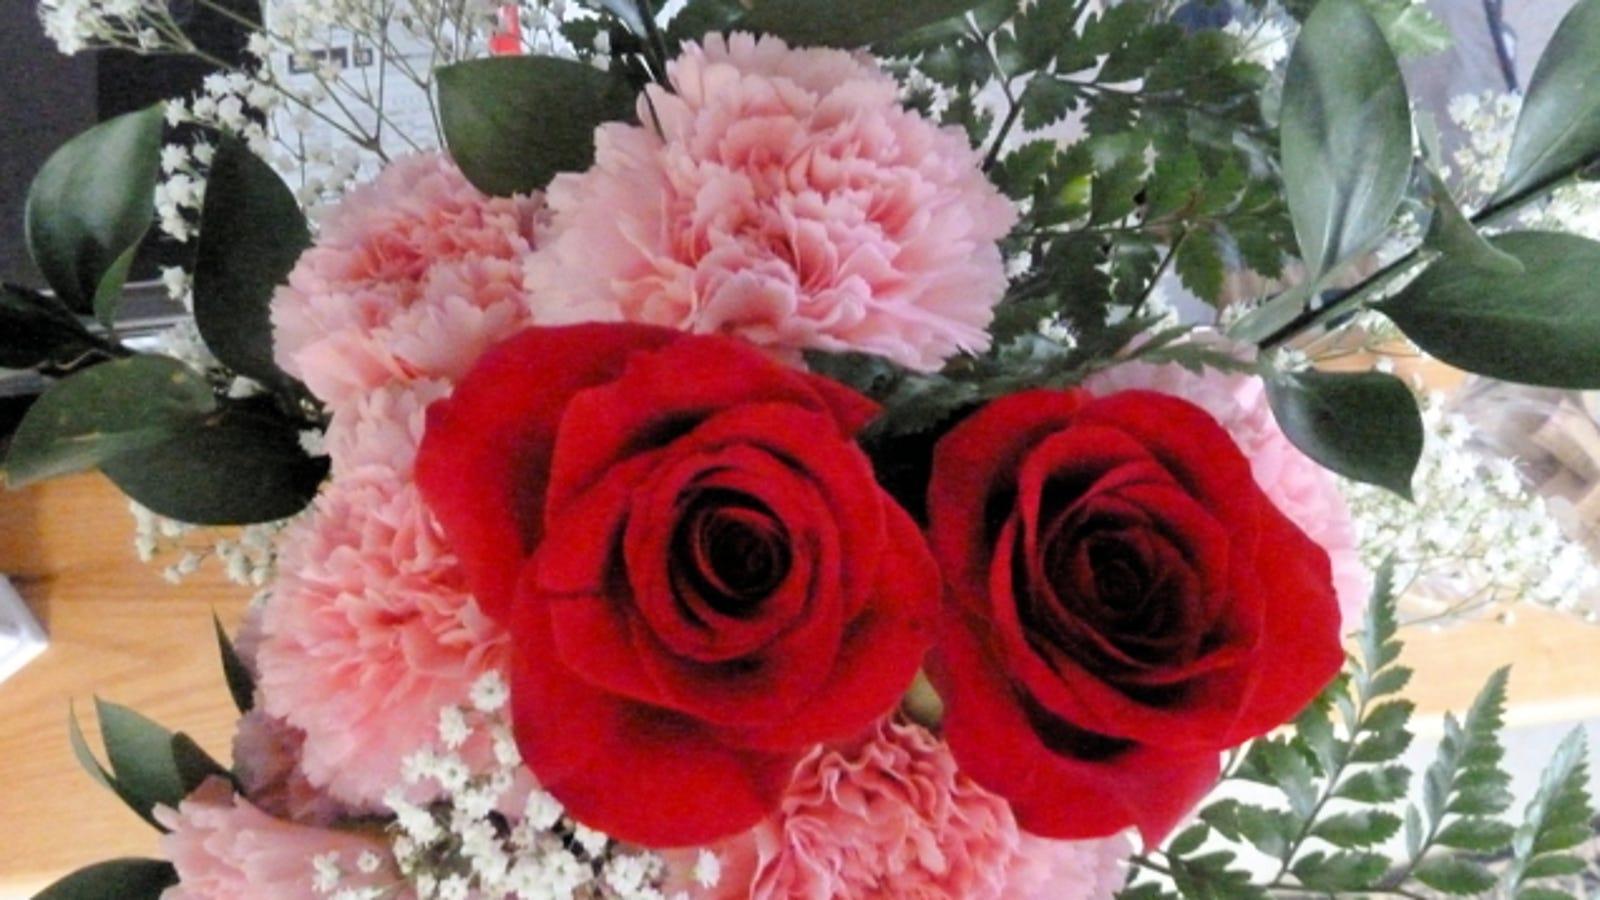 Find a local florist instead of buying online izmirmasajfo